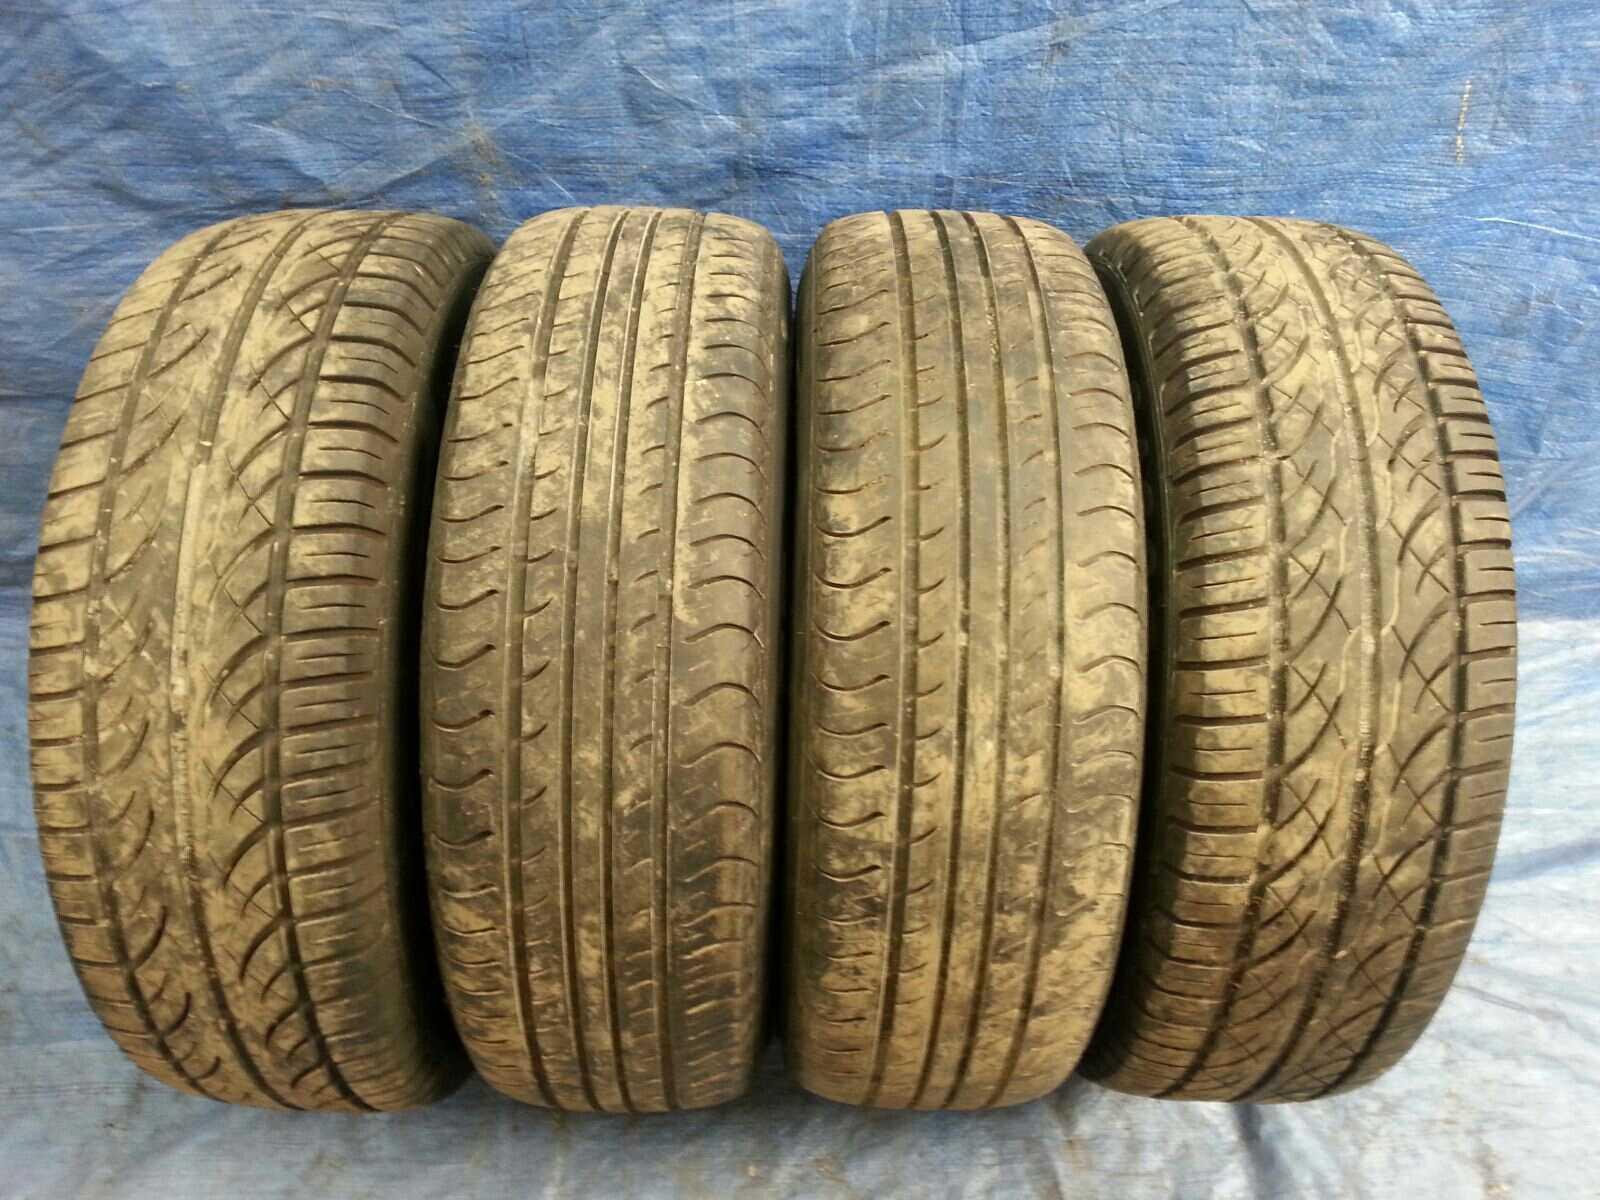 VW golf passat 15 inch 5 stud 5x100 alloy wheels with tyres | eBay